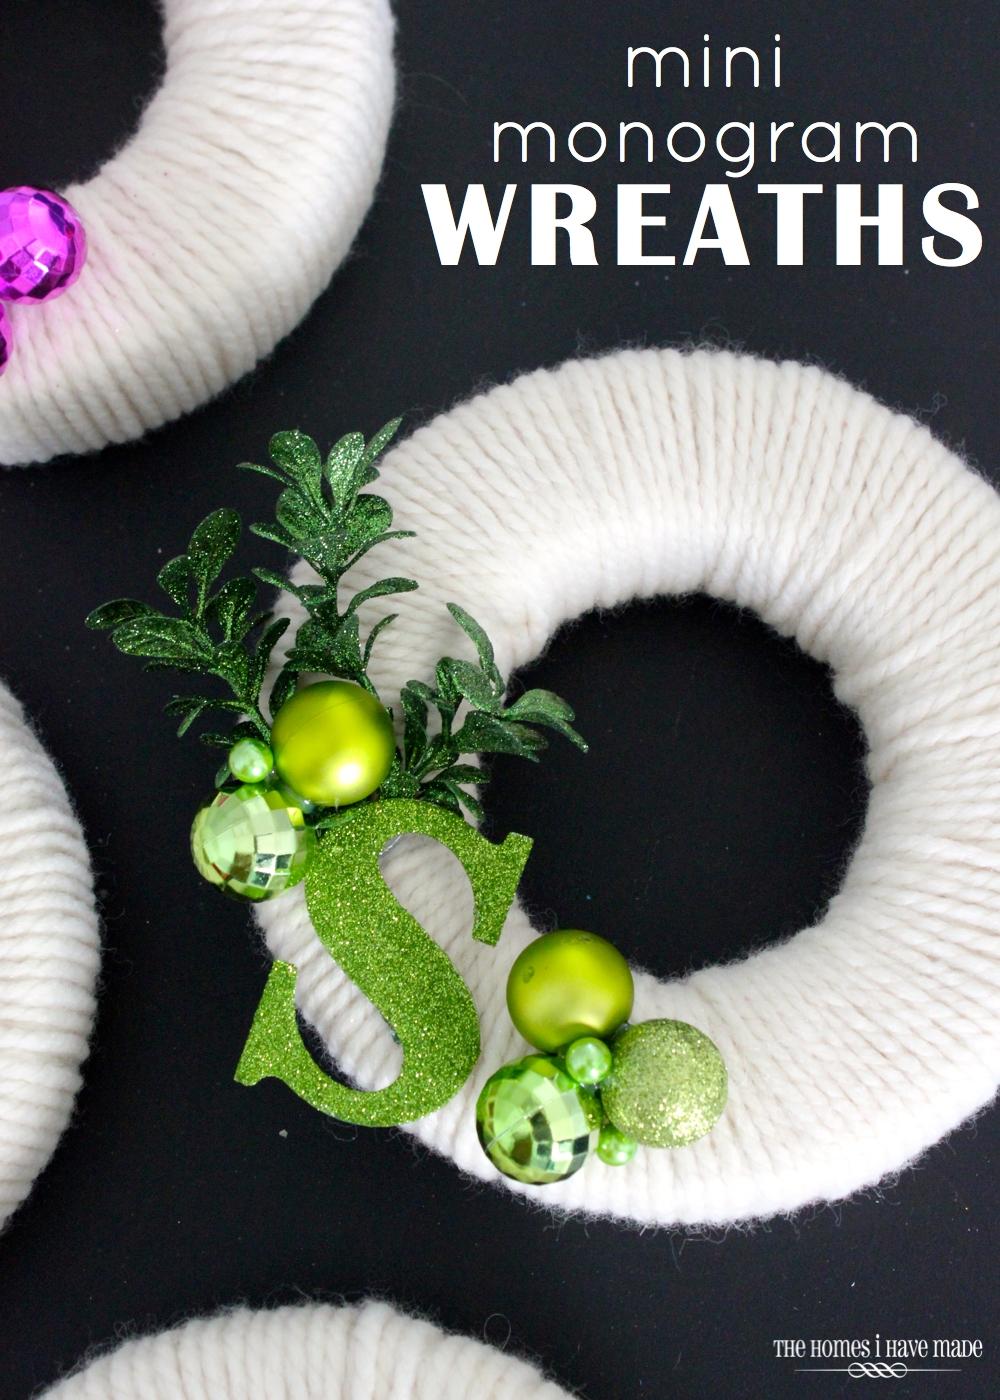 Mini Monogram Wreaths | The Homes I Have Made